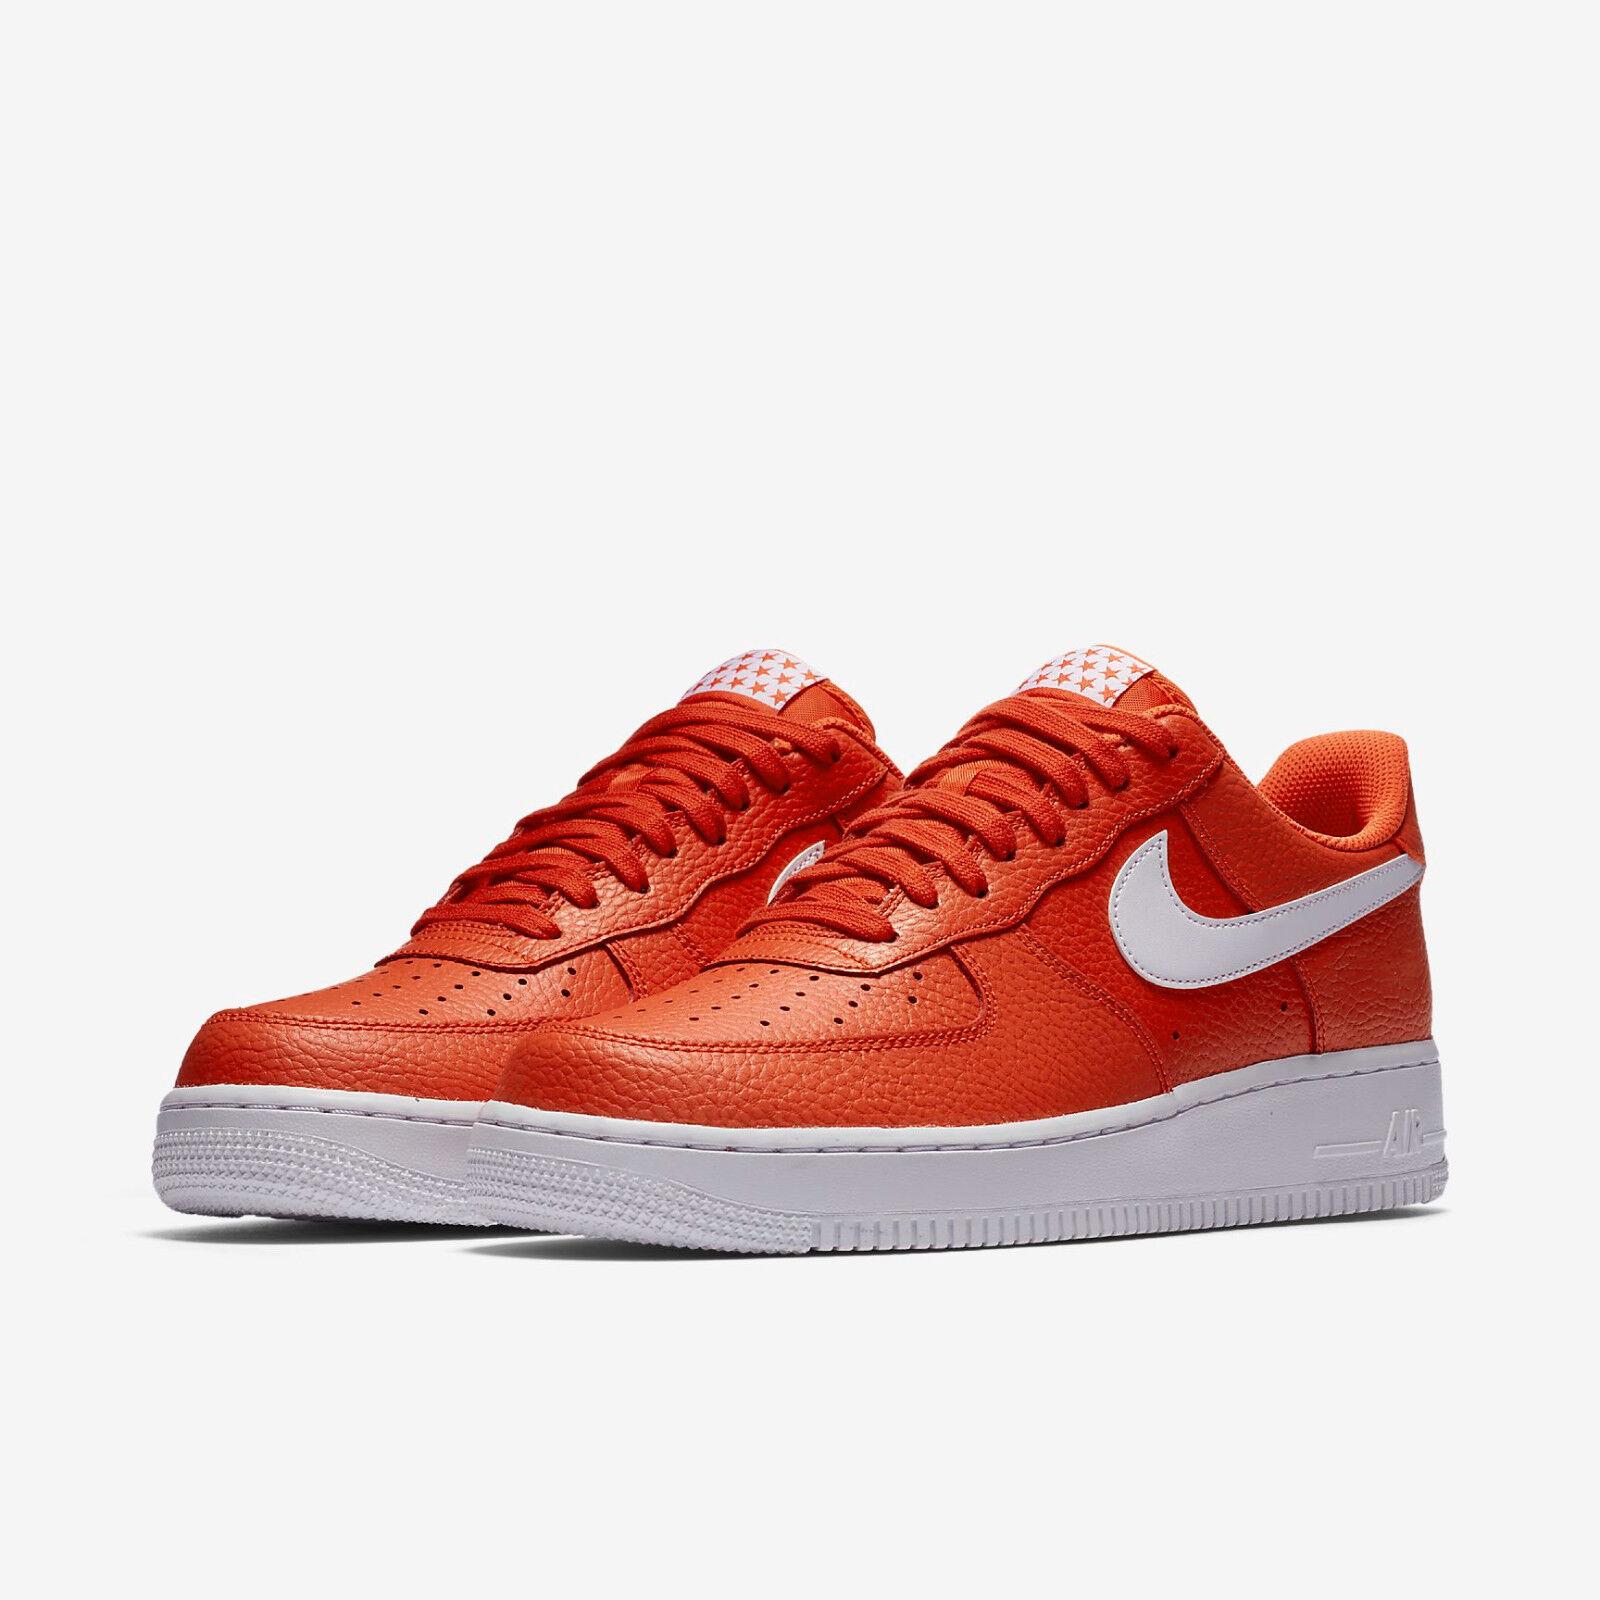 NIKE homme Air Obliger 1 '07 faible Top Sneaker (Team Orange/blanc)